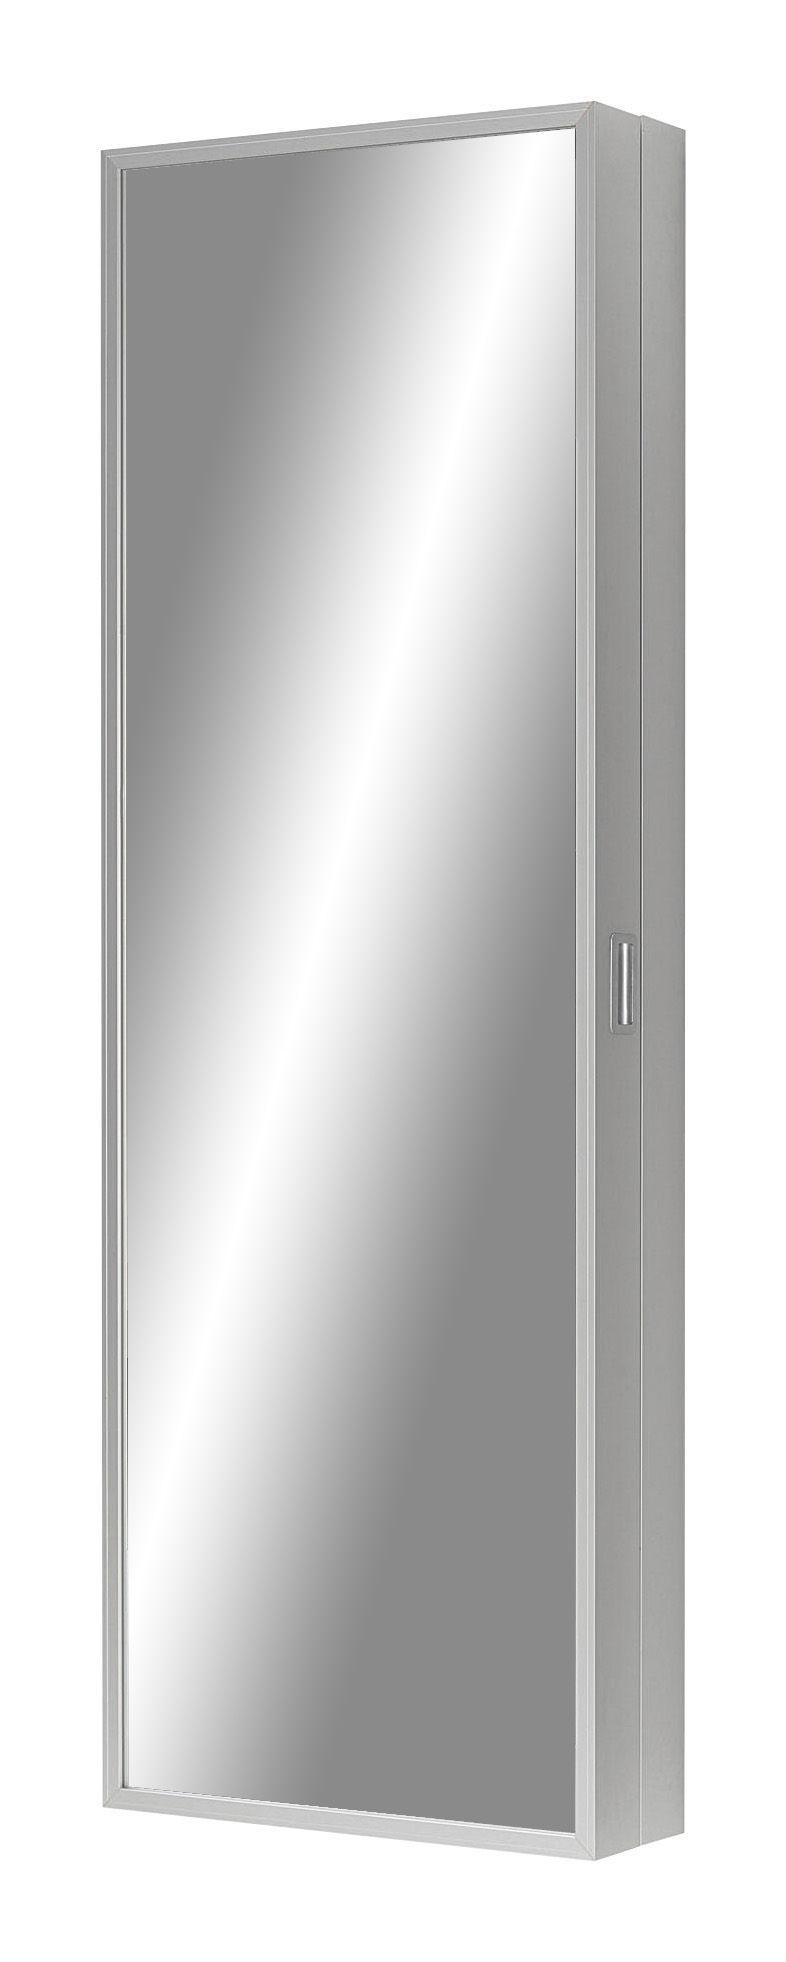 Mobilier - Meubles de rangement - Meuble à chaussures Foot Box - Kristalia - Aluminium - Miroir - Aluminium anodisé, Miroir